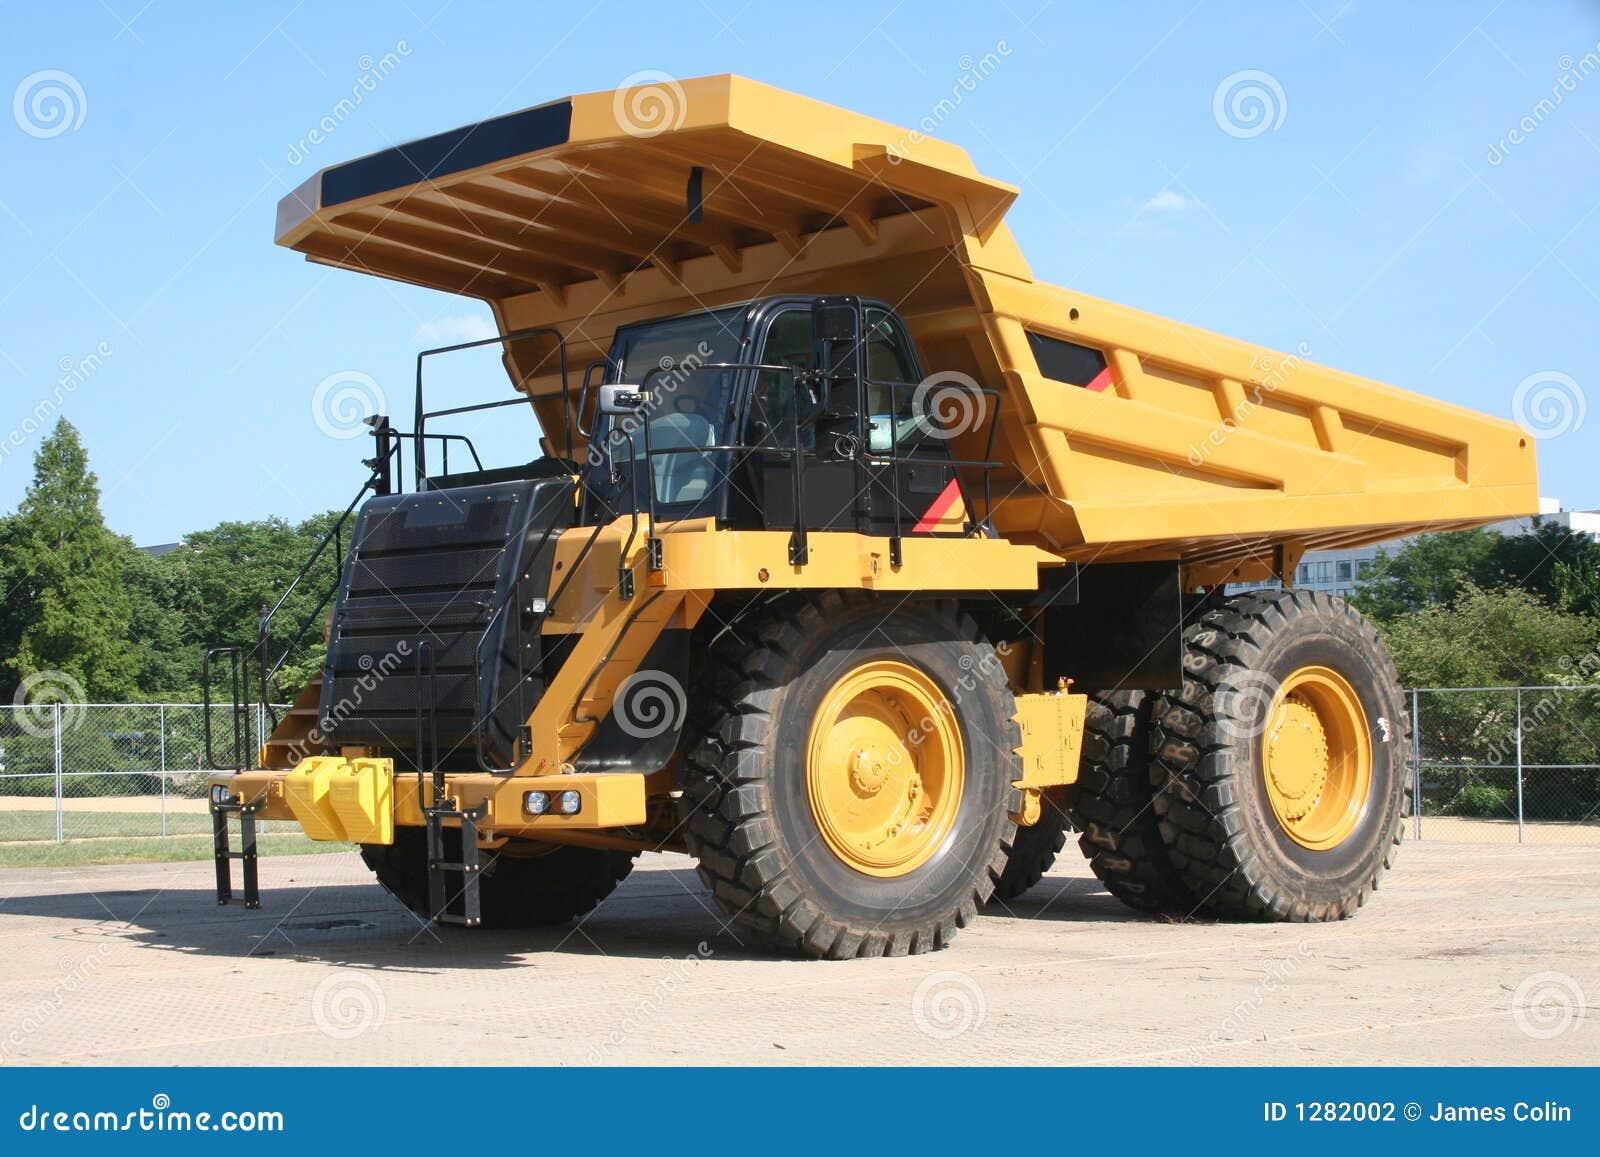 Heavy Duty Truck >> Heavy Duty Dump Truck Stock Photo Image Of Strong Carry 1282002